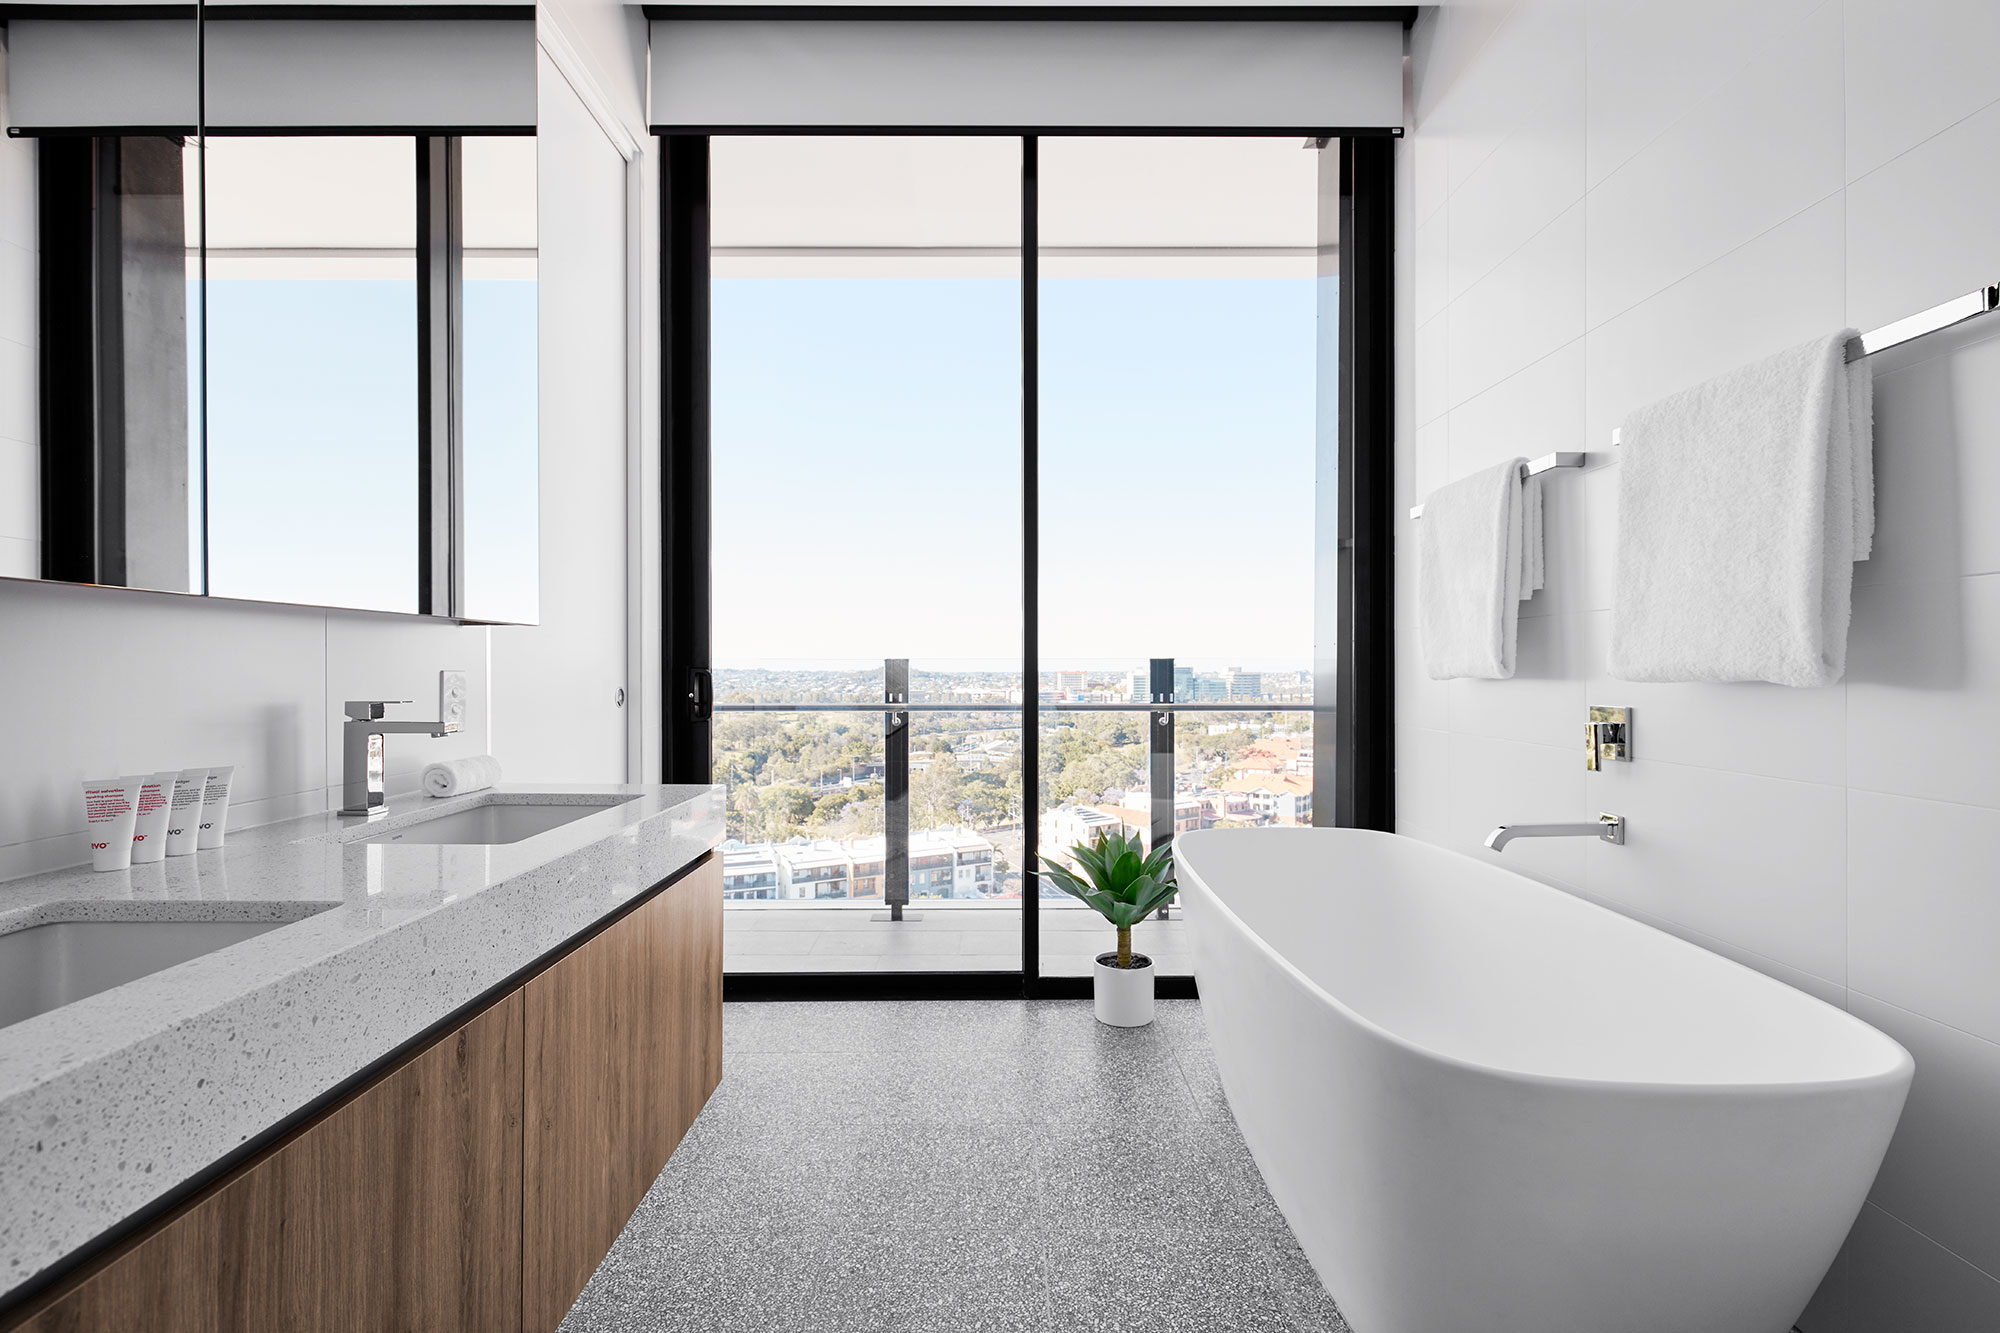 Penthouse bathing. Malin+Goetz bathing.